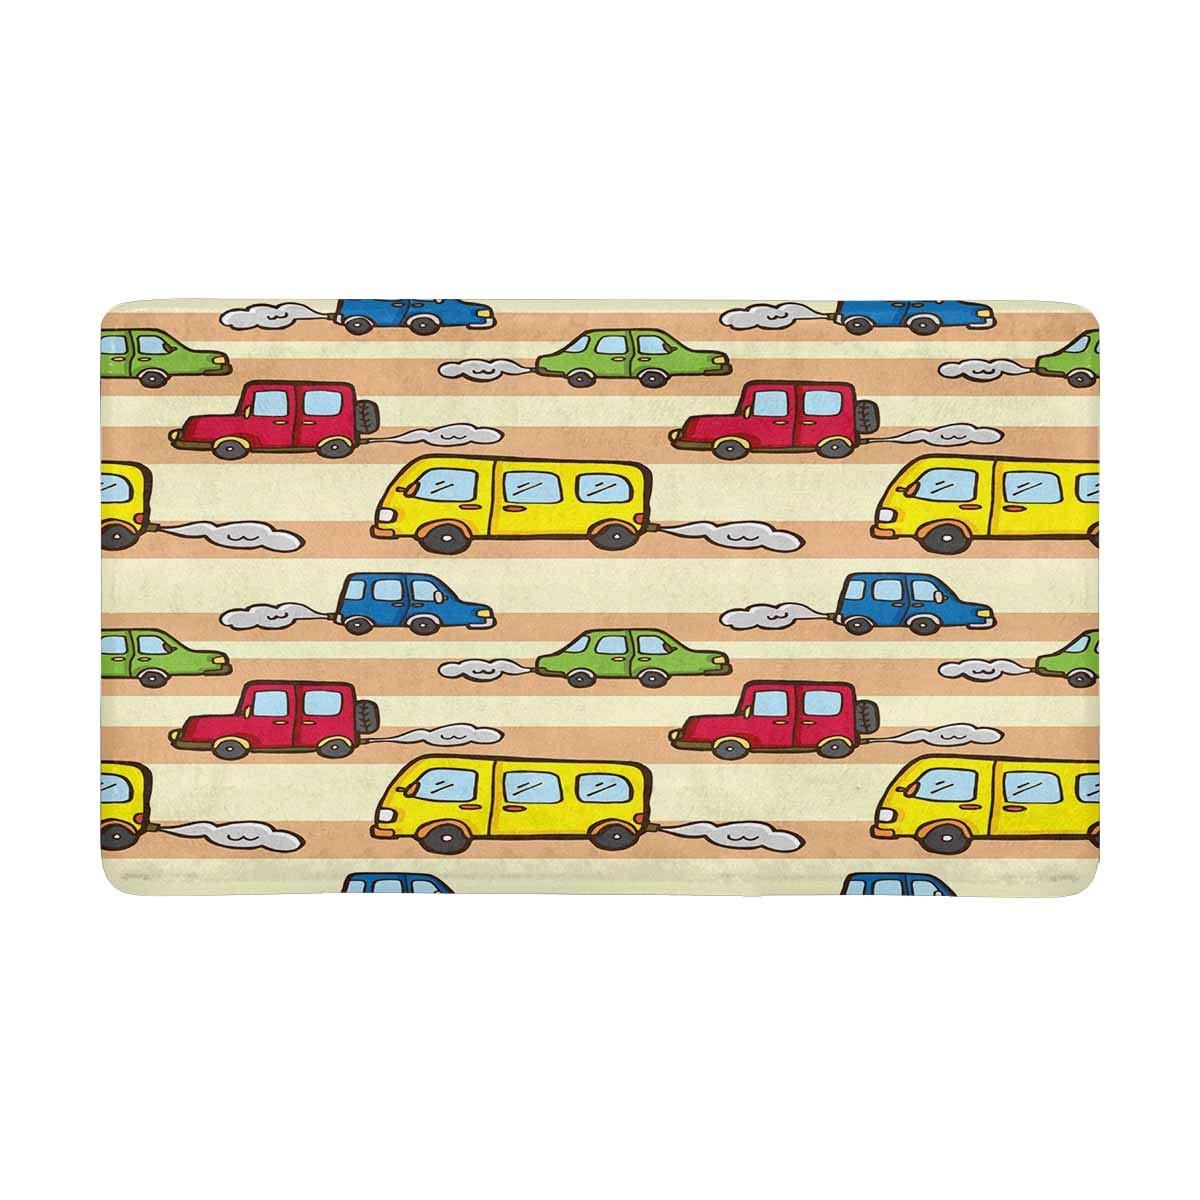 InterestPrint Cartoon Car Pattern Anti-Slip Door Mat Home Decor Indoor Entrance Doormat Rubber Backing 30 X 18 Inches